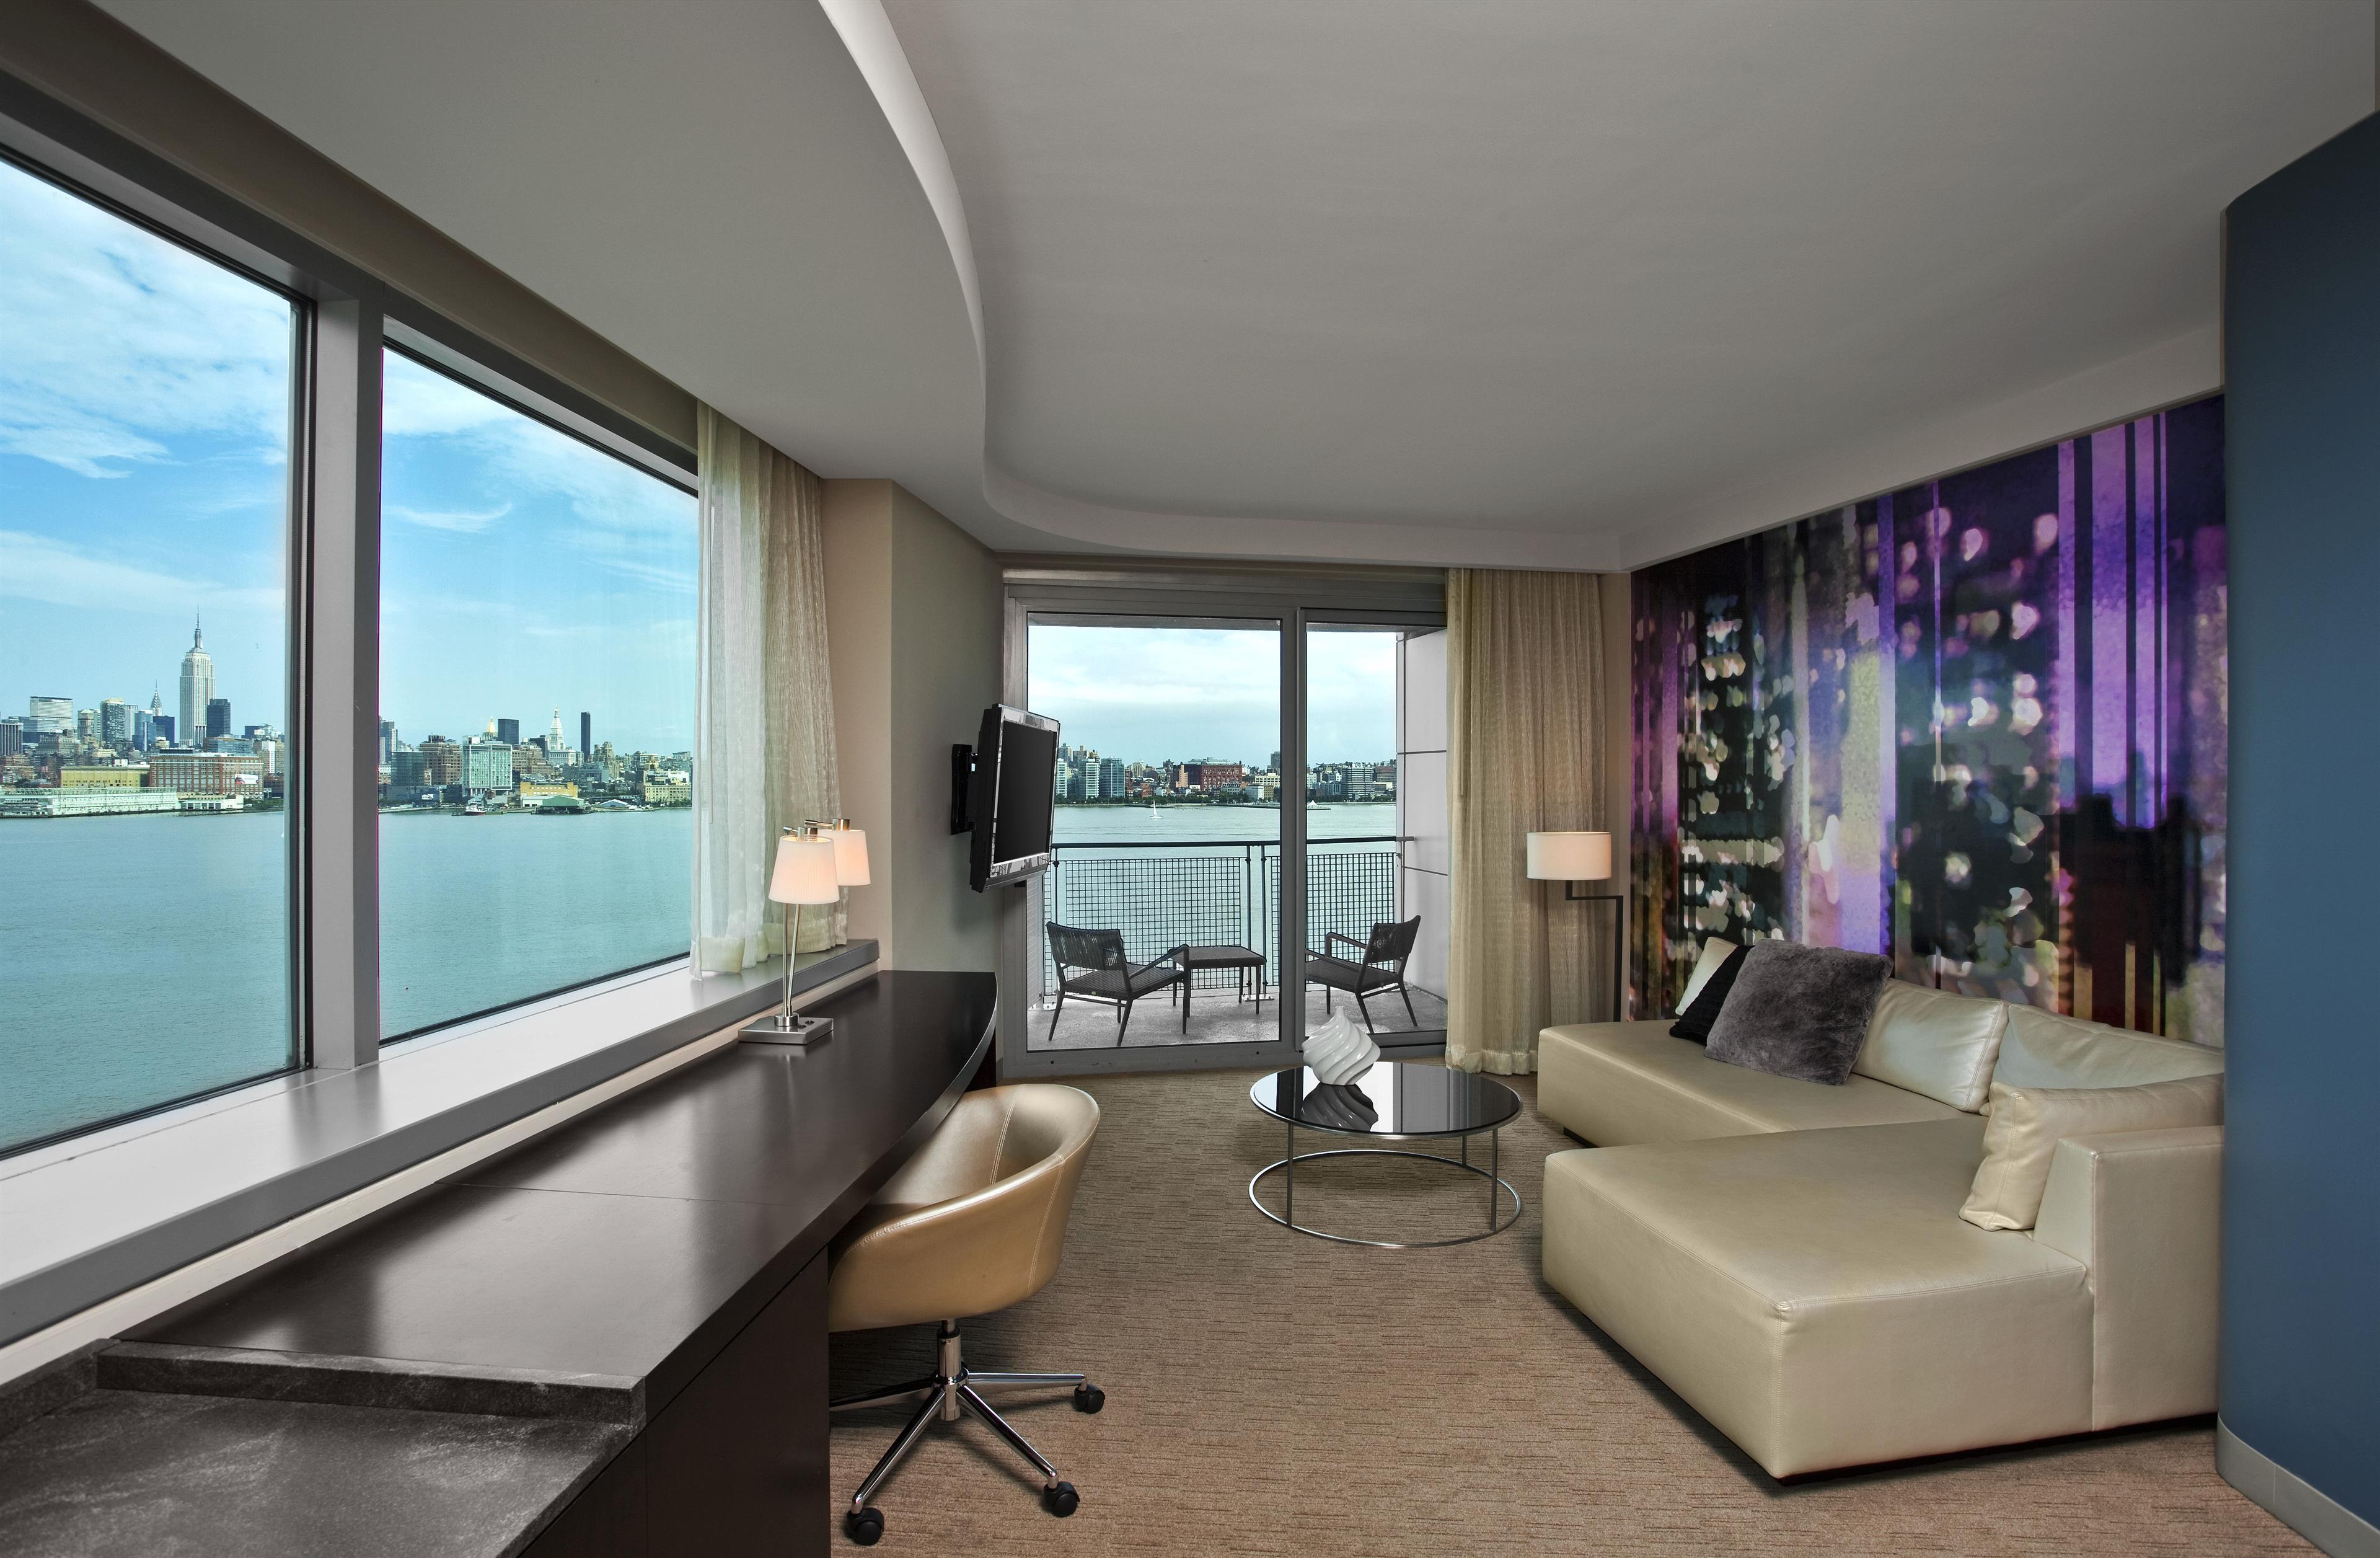 Apartment:top hoboken nj apartments best home design excellent at hoboken nj apartments furniture design hoboken nj